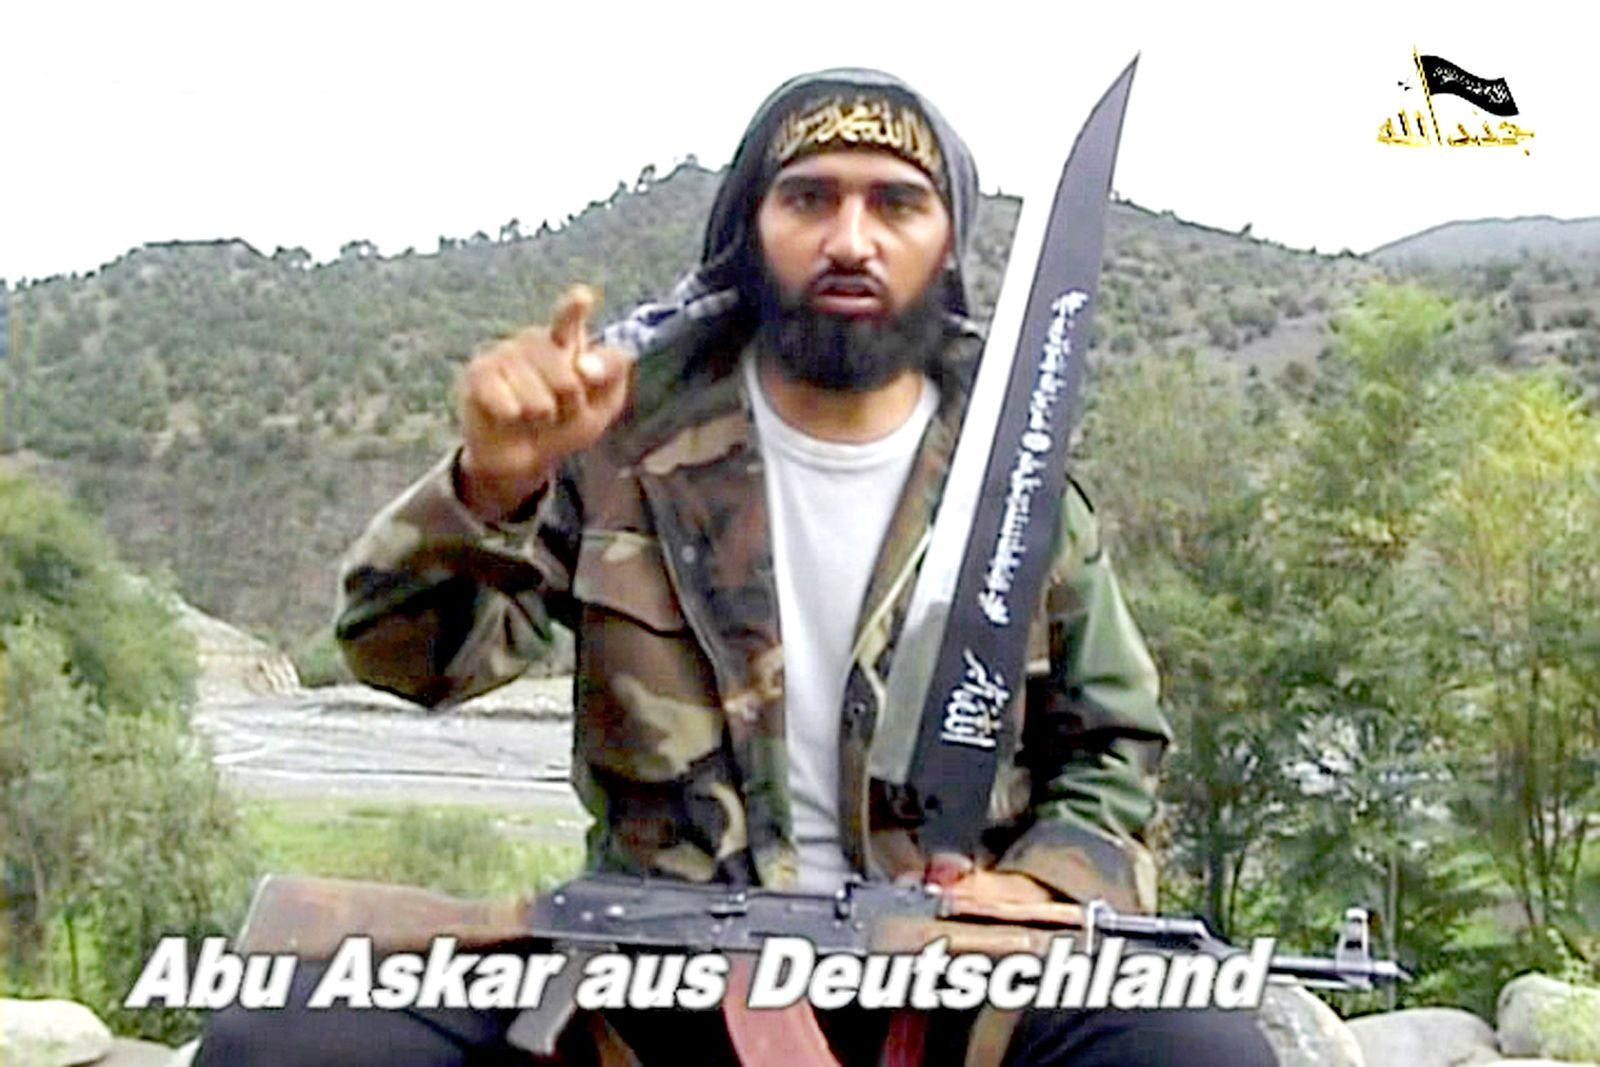 DER SPIEGEL 9/2012 pp 40 SPIN / Abu Askar